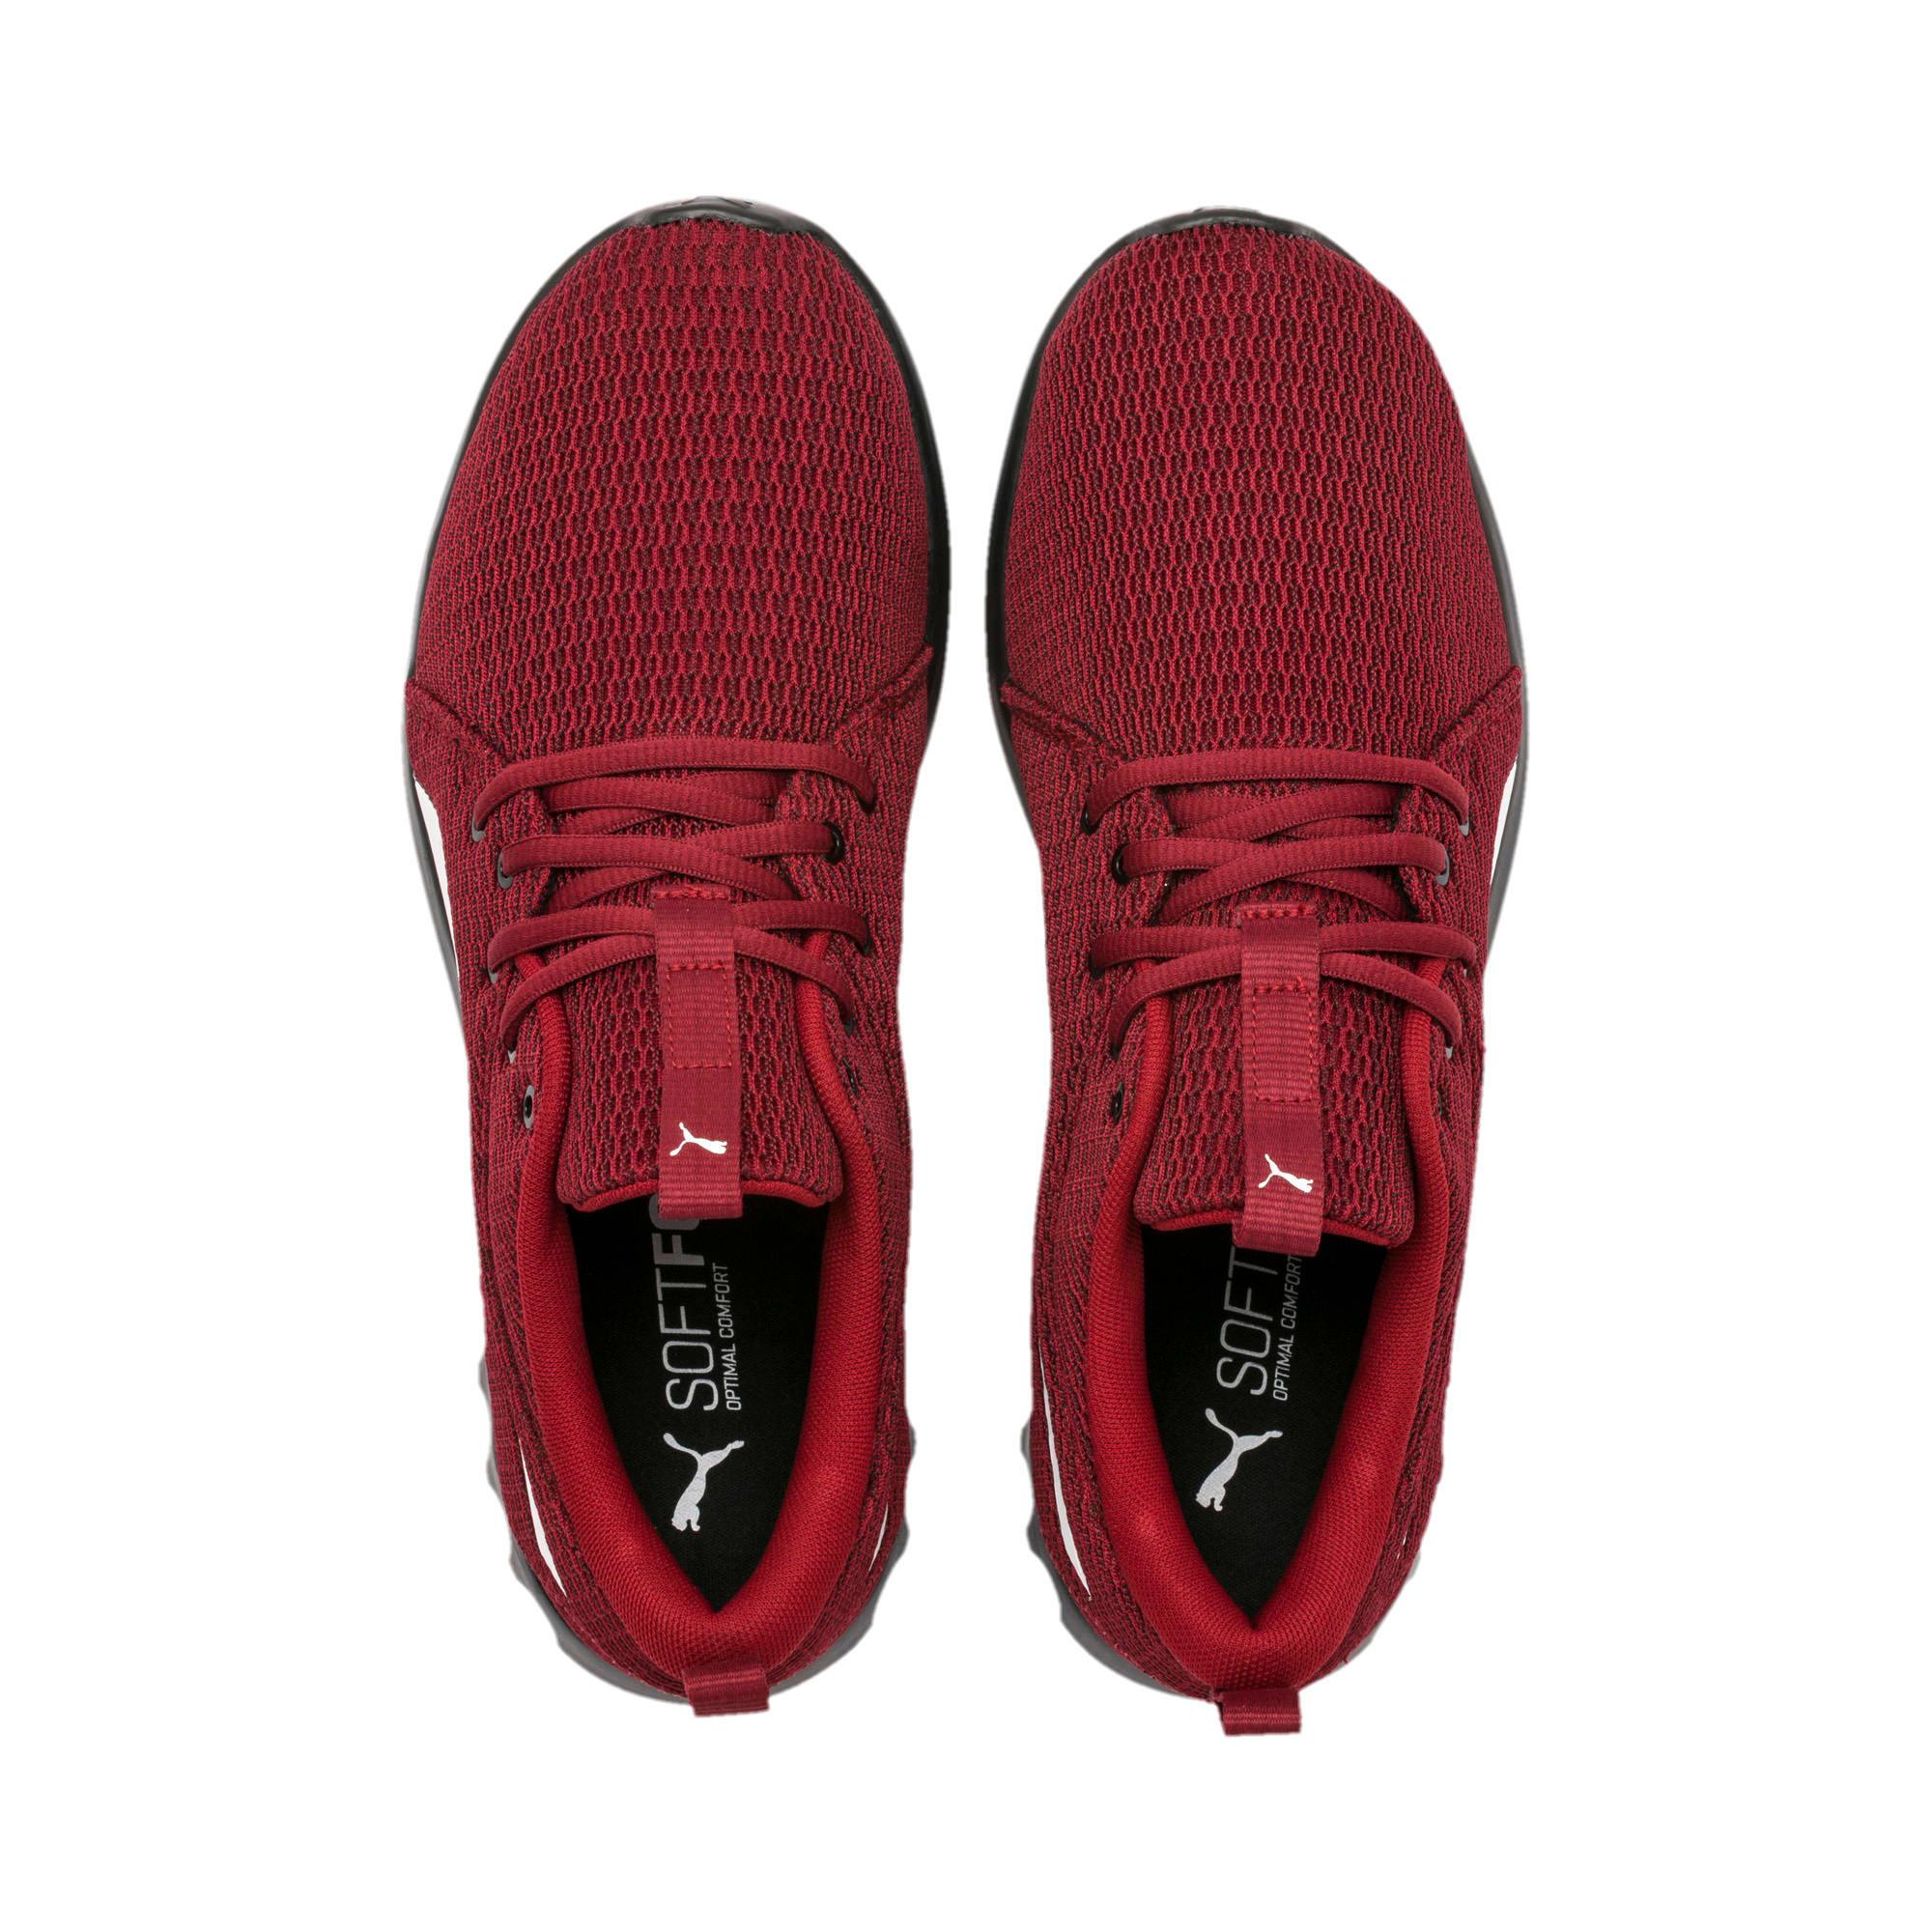 Thumbnail 7 of Carson 2 New Core Men's Running Shoes, Rhubarb-White-Black, medium